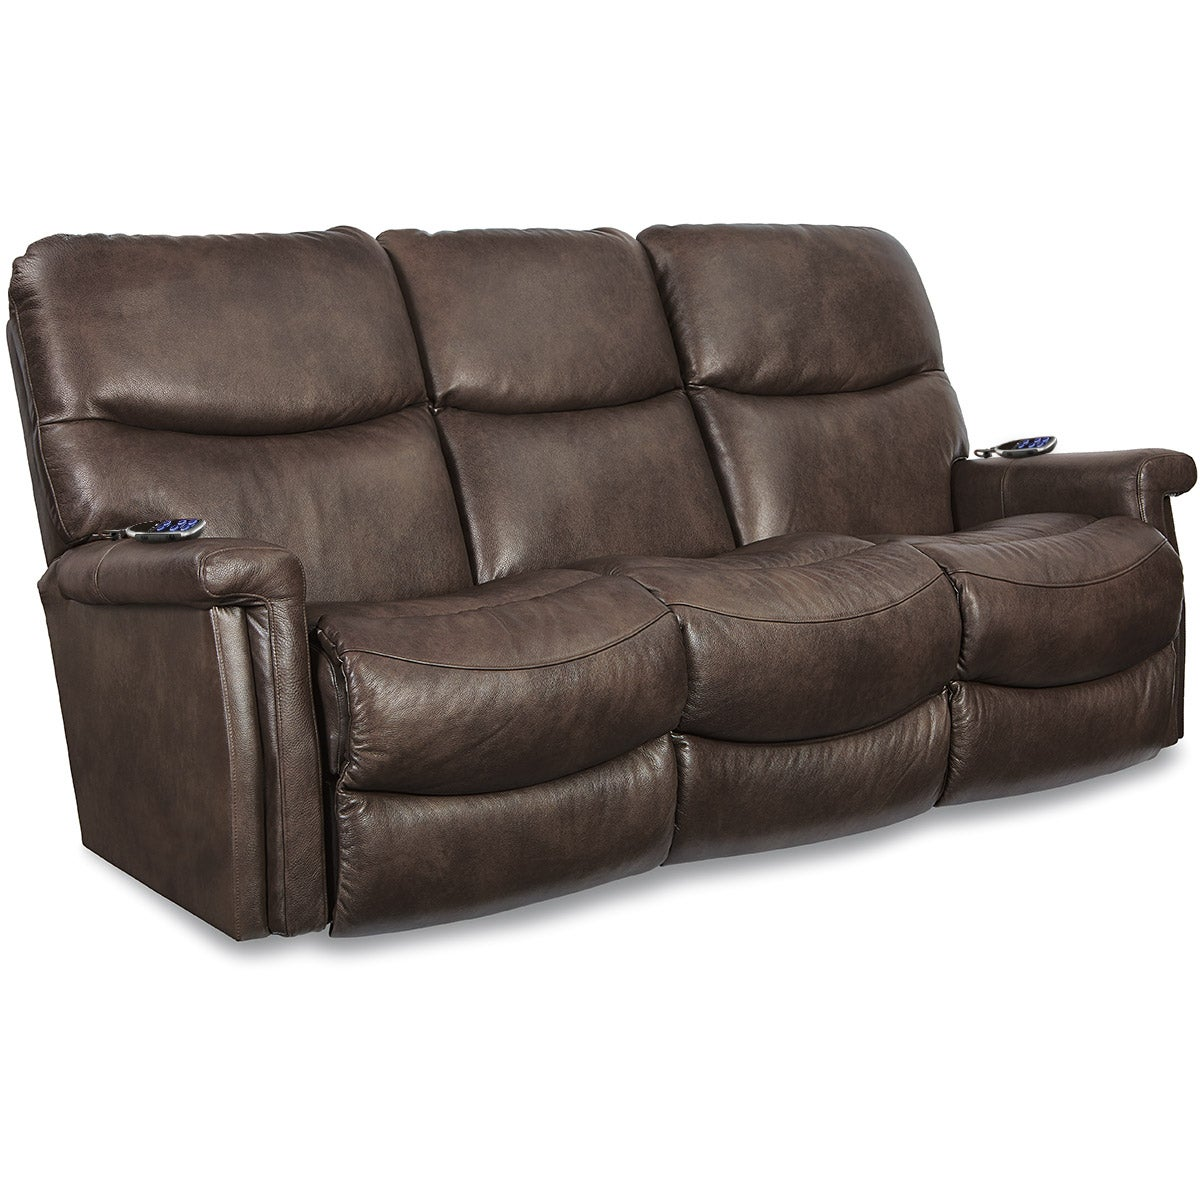 Baylor powerreclinexrw full reclining sofa - Sofa reclinable ...